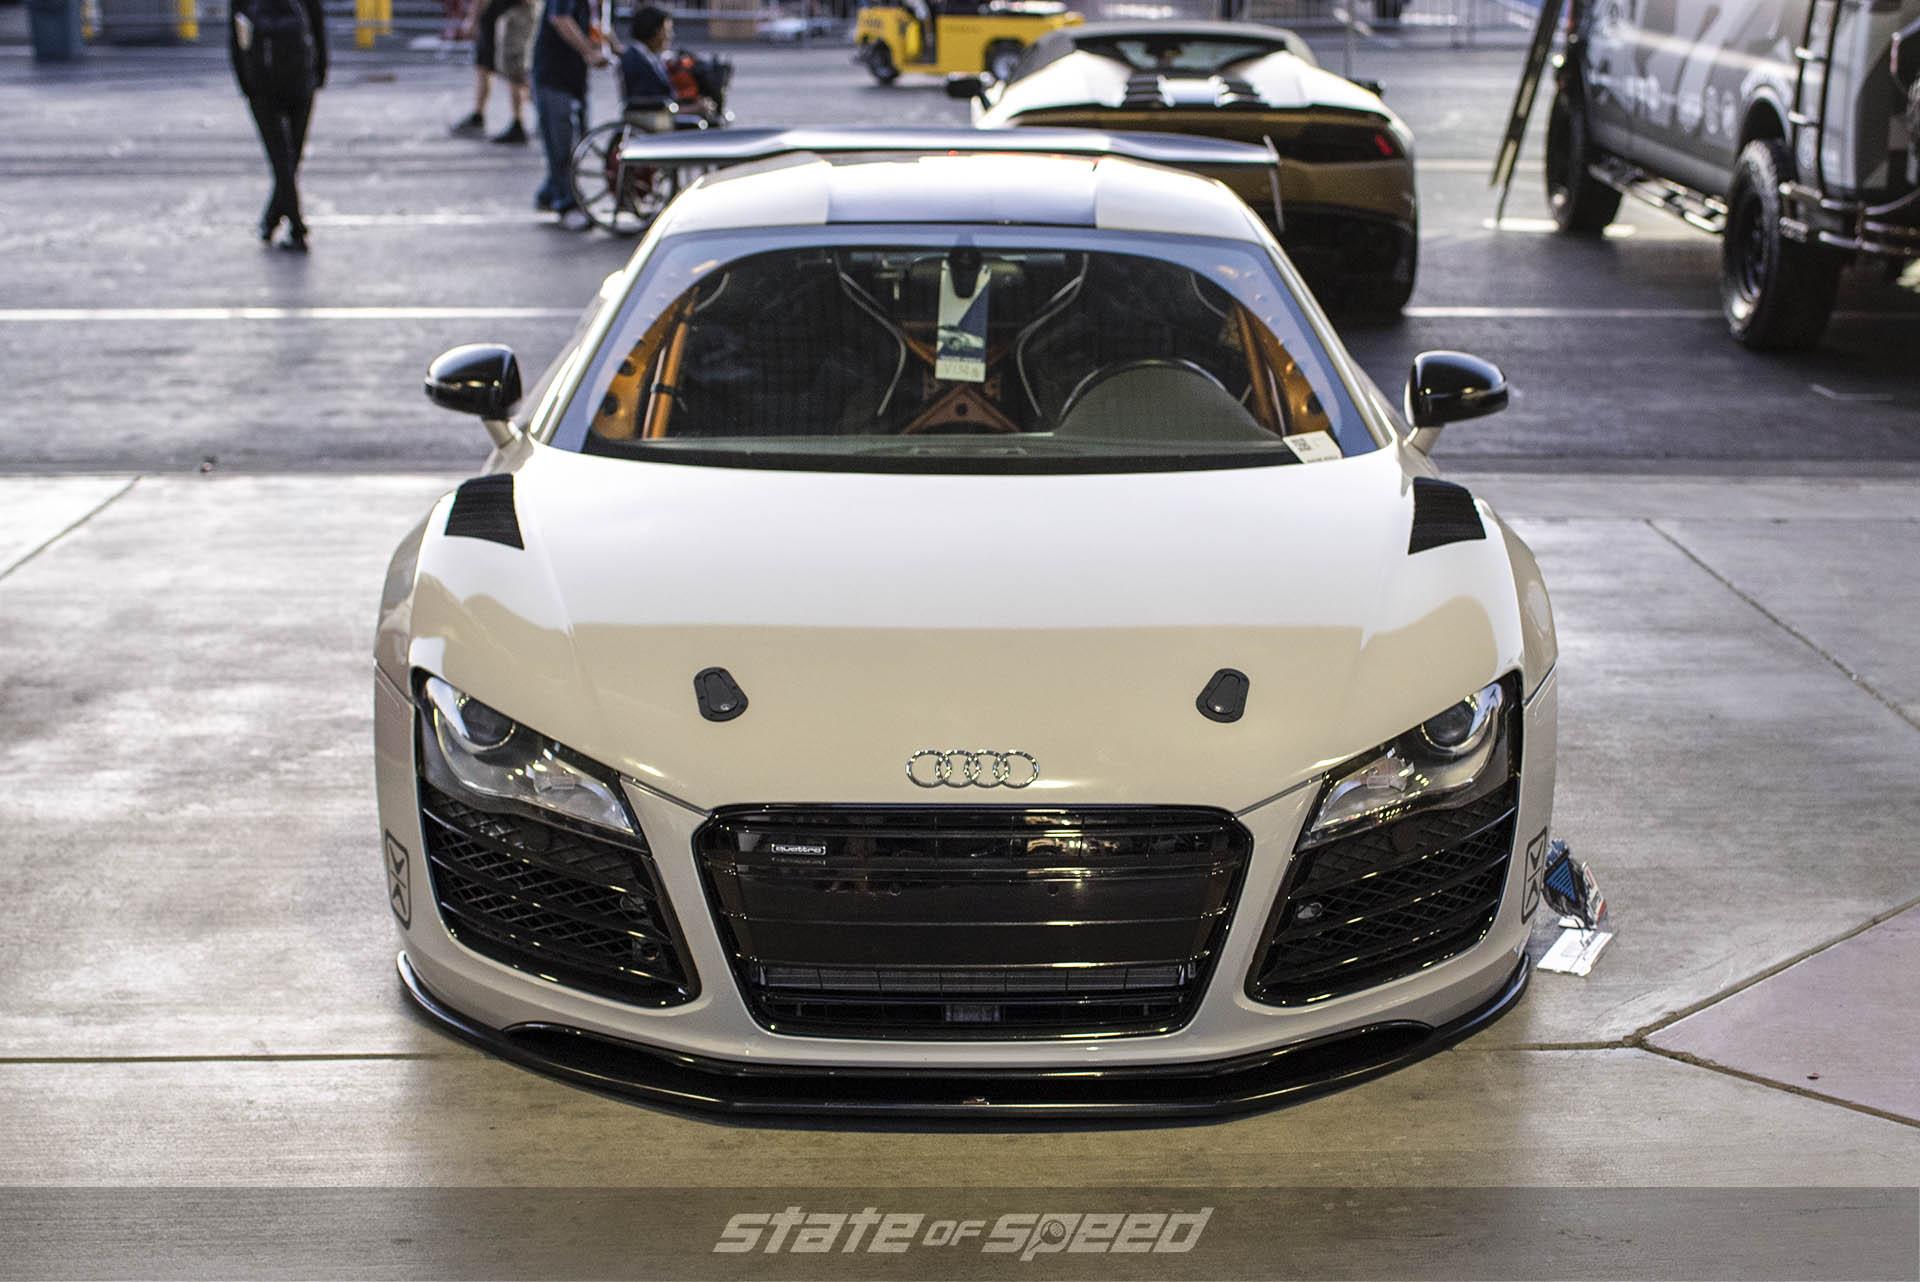 Audi R8 build at the SEMA show in Las Vegas